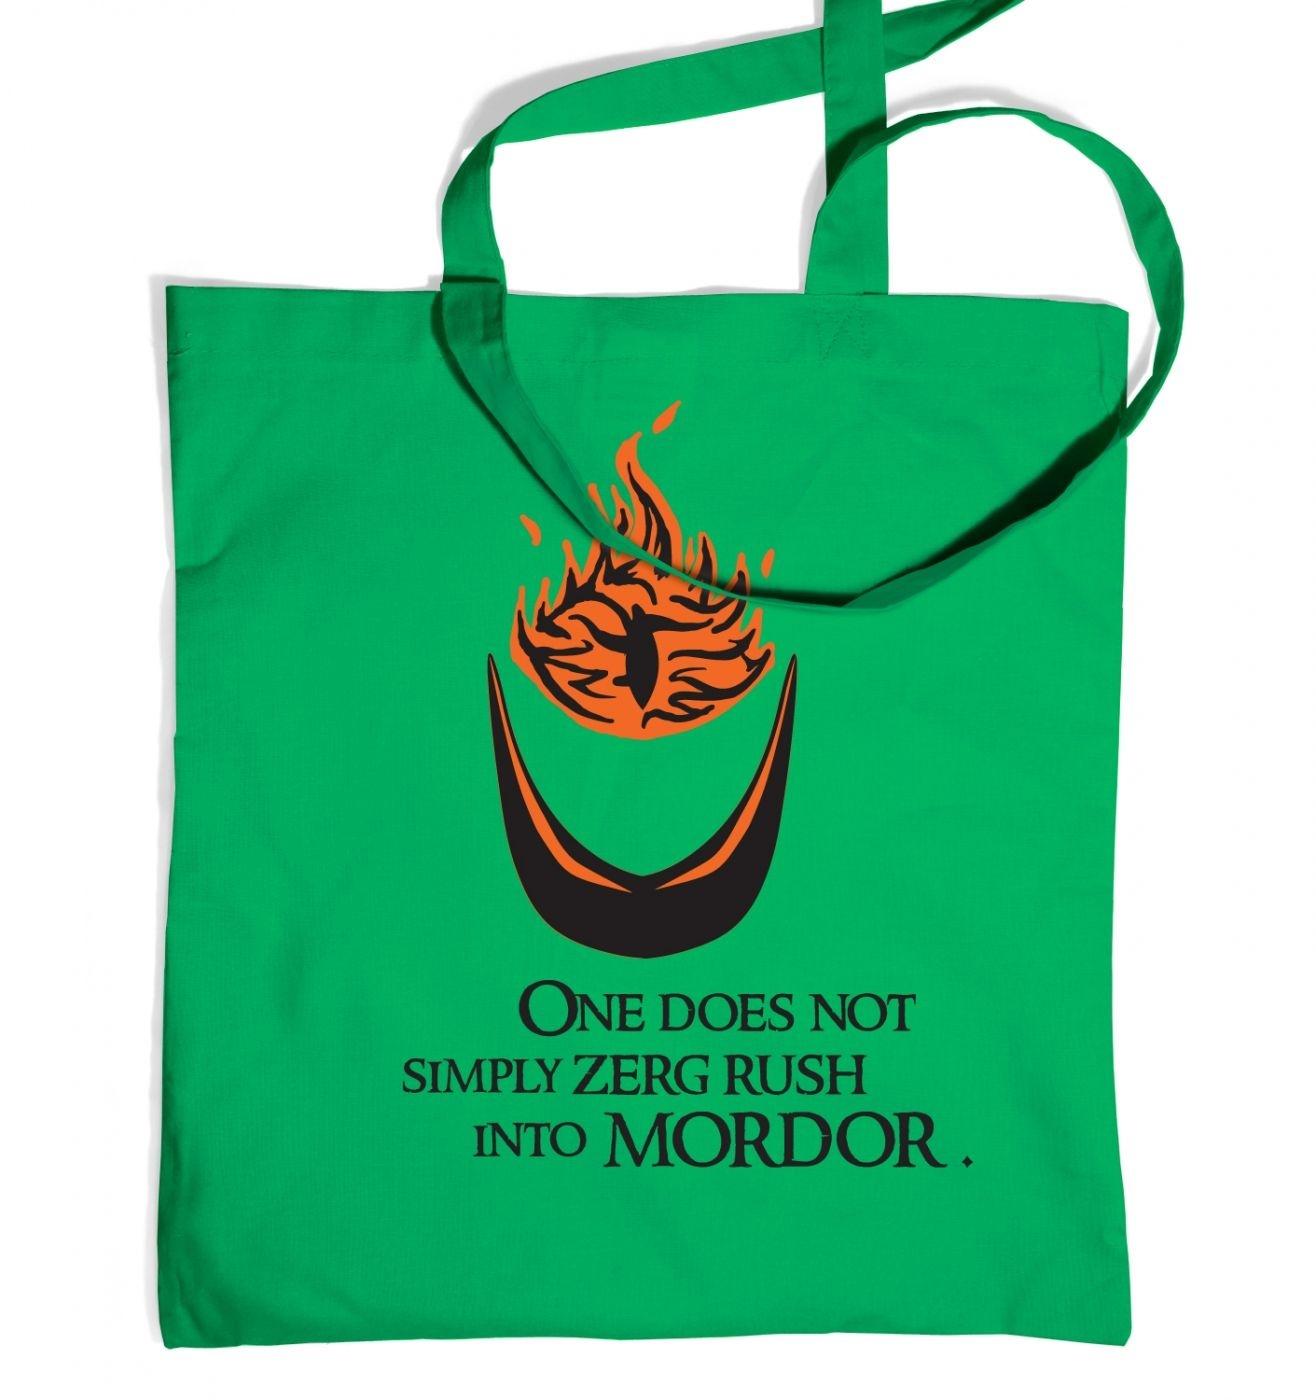 Zerg Rush into Mordor tote bag